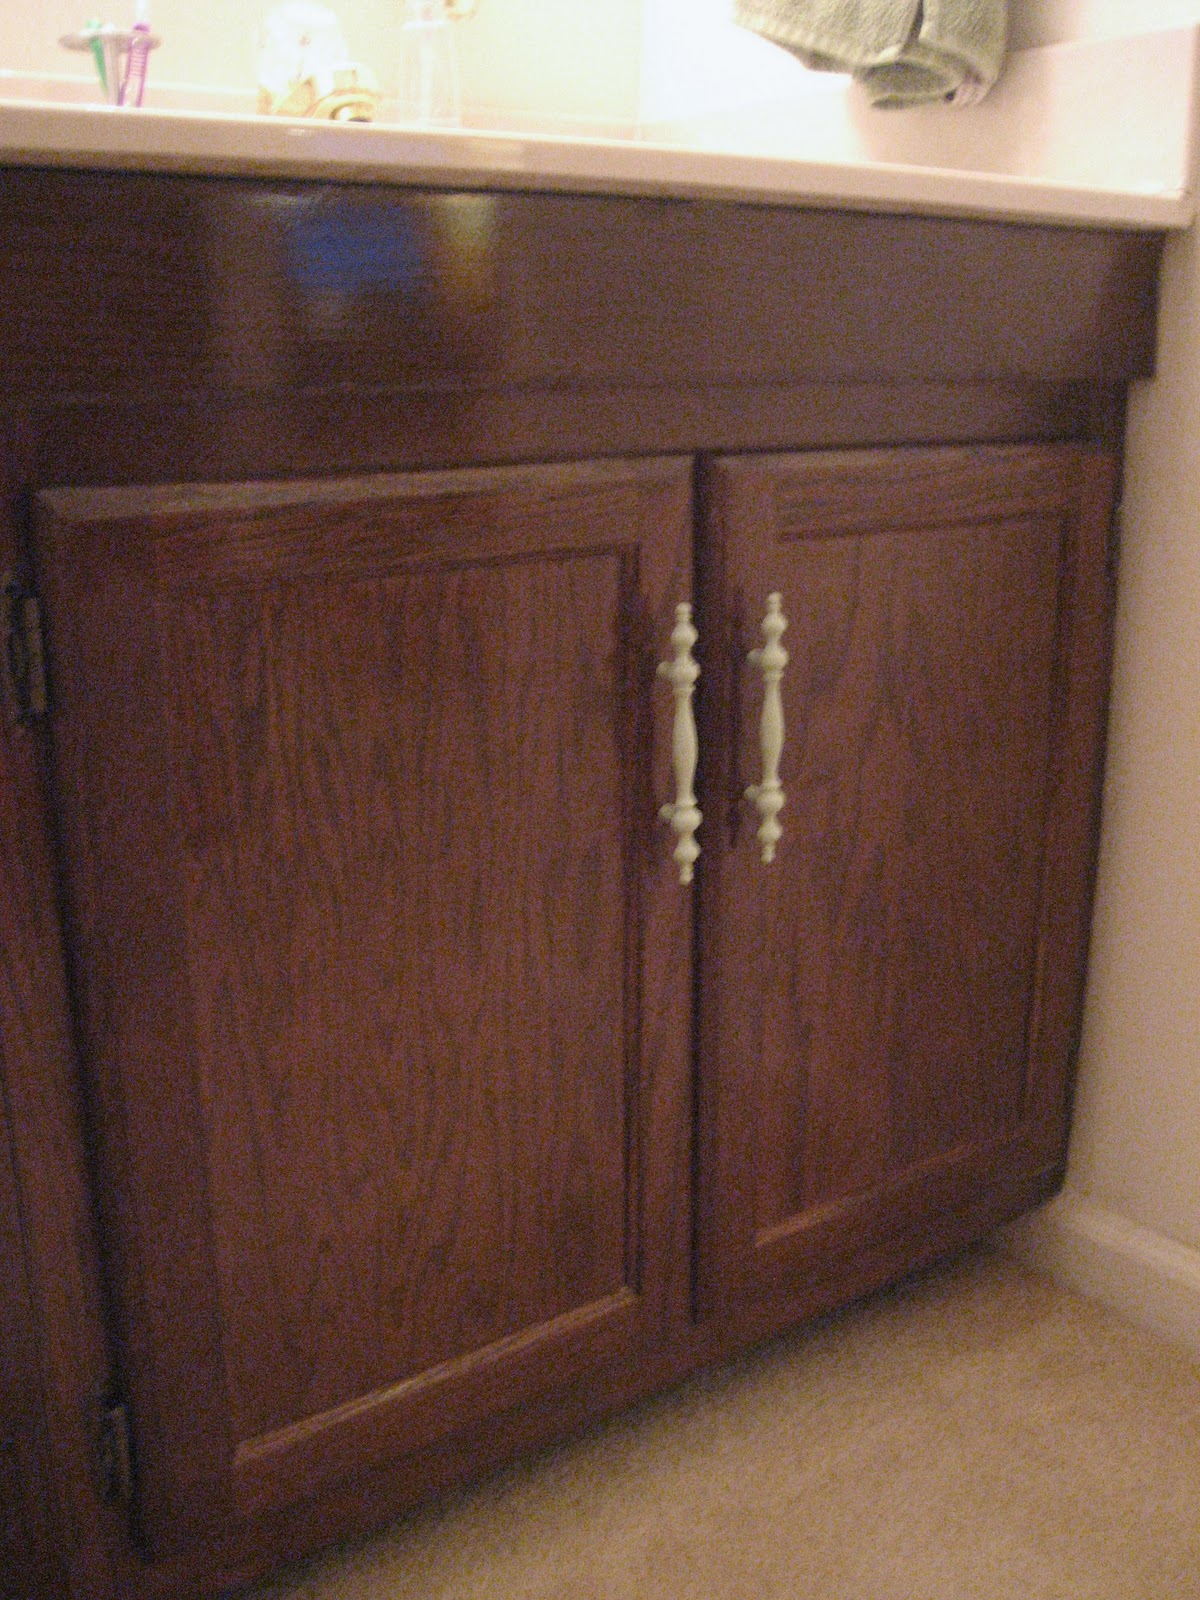 Bathroom Cabinet Pulls dact